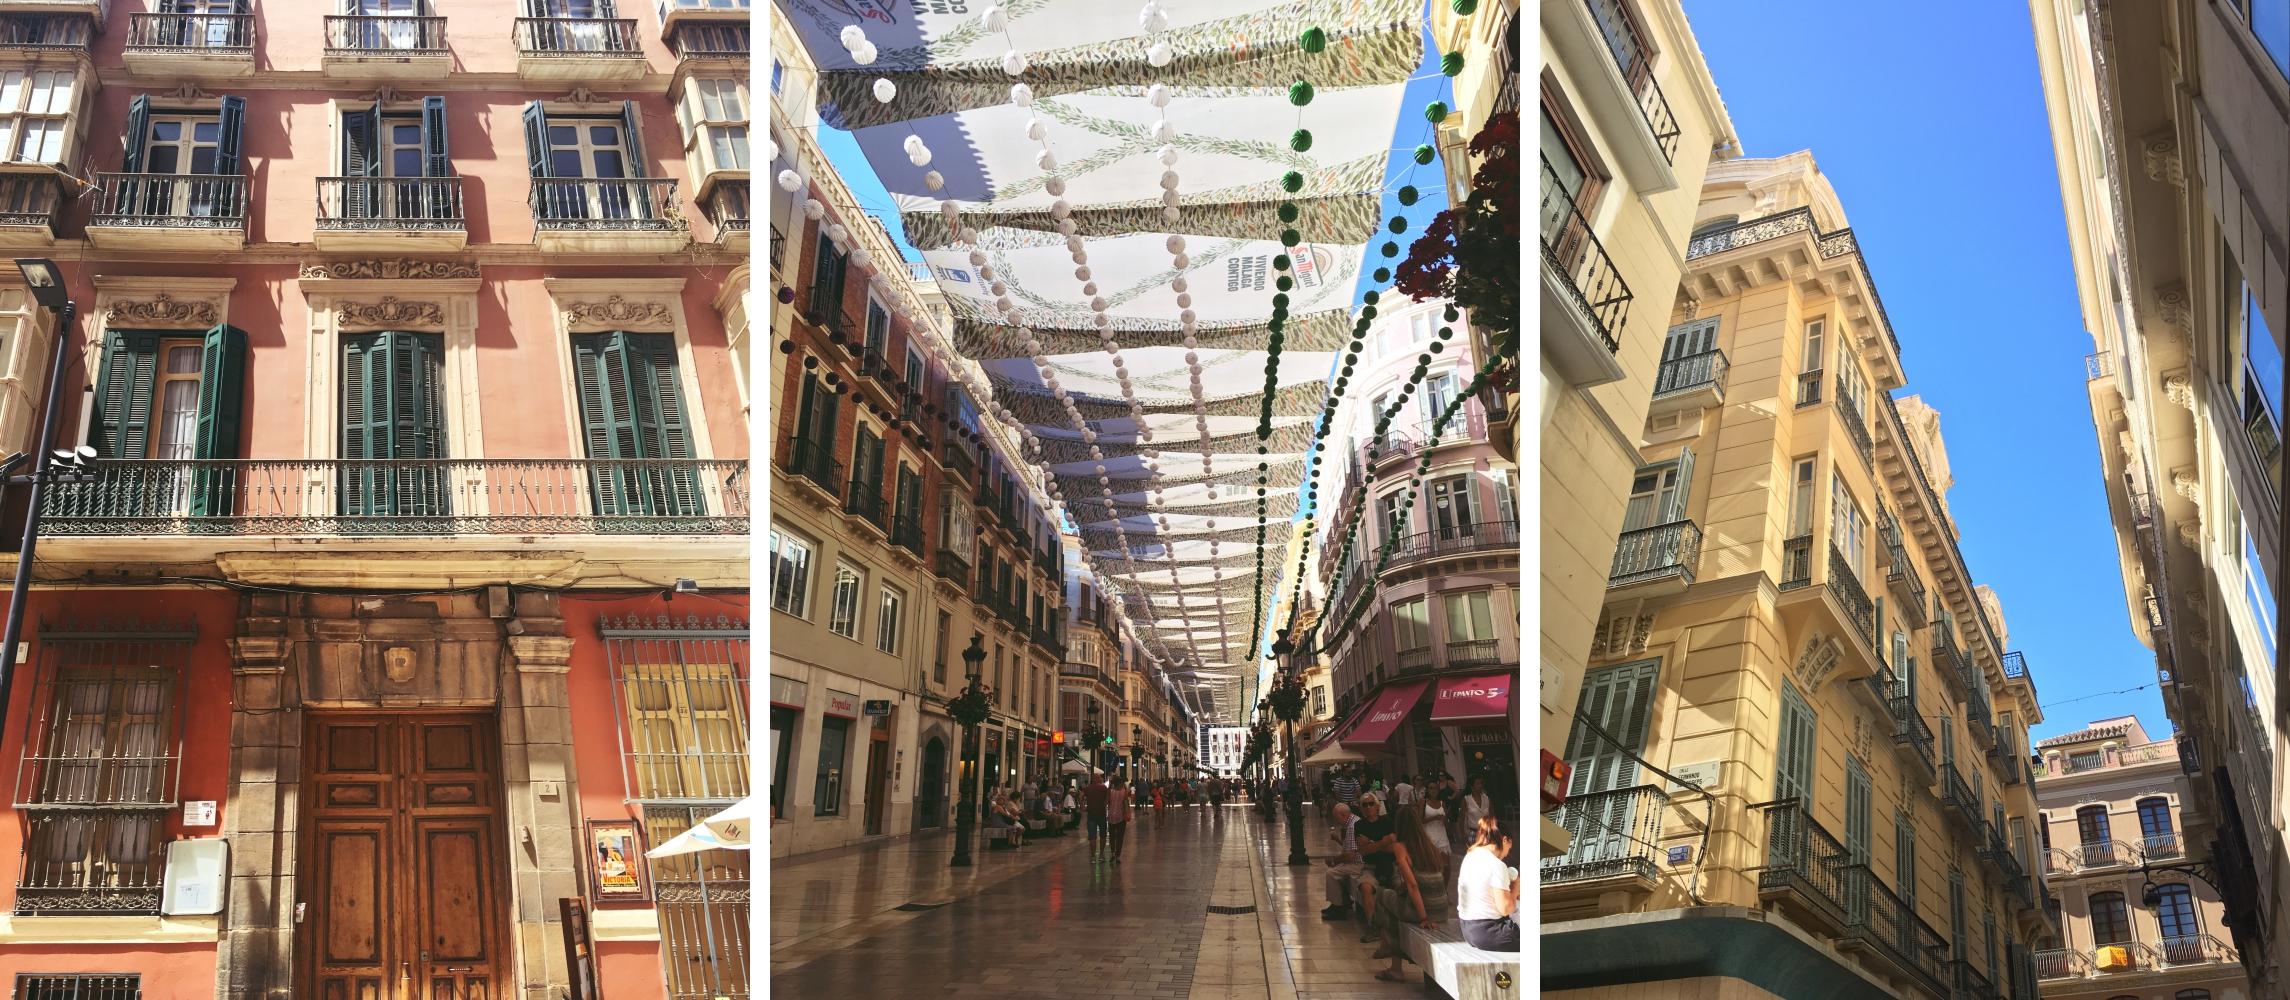 Ein perfekter Tag in Malaga